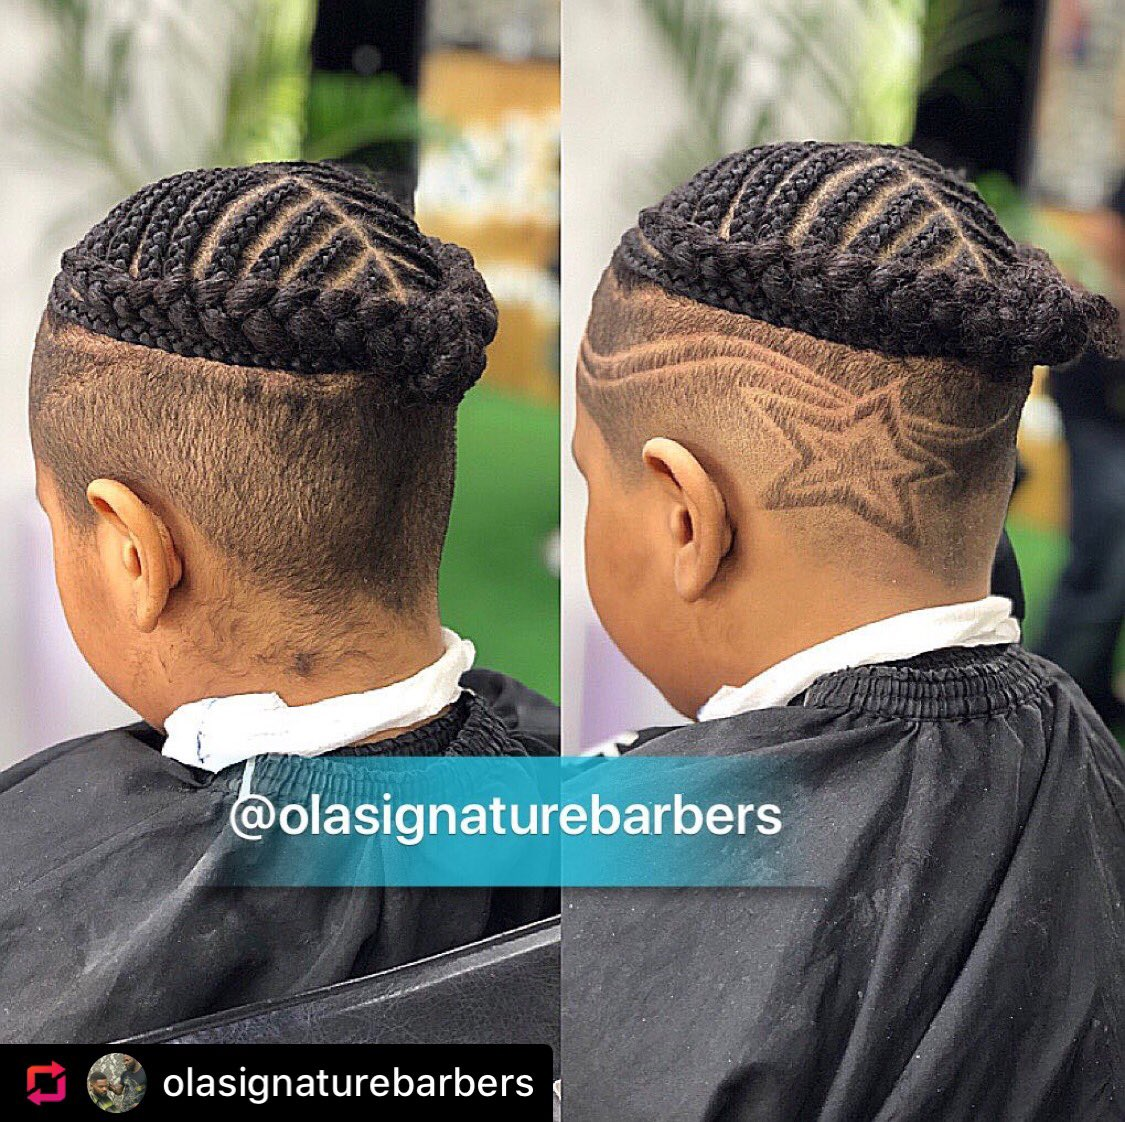 Book your appointment with @olasignature05 . Trust me you will never regret having a good haircut #barbershop #bopdaddychallenge #merrymen2 #whatwillfalzdo #figofreestylechallenge #30bg #davidoofficial #zlantaibile #nairamarley #instagood #instagram #instablog #ibbossnation #don